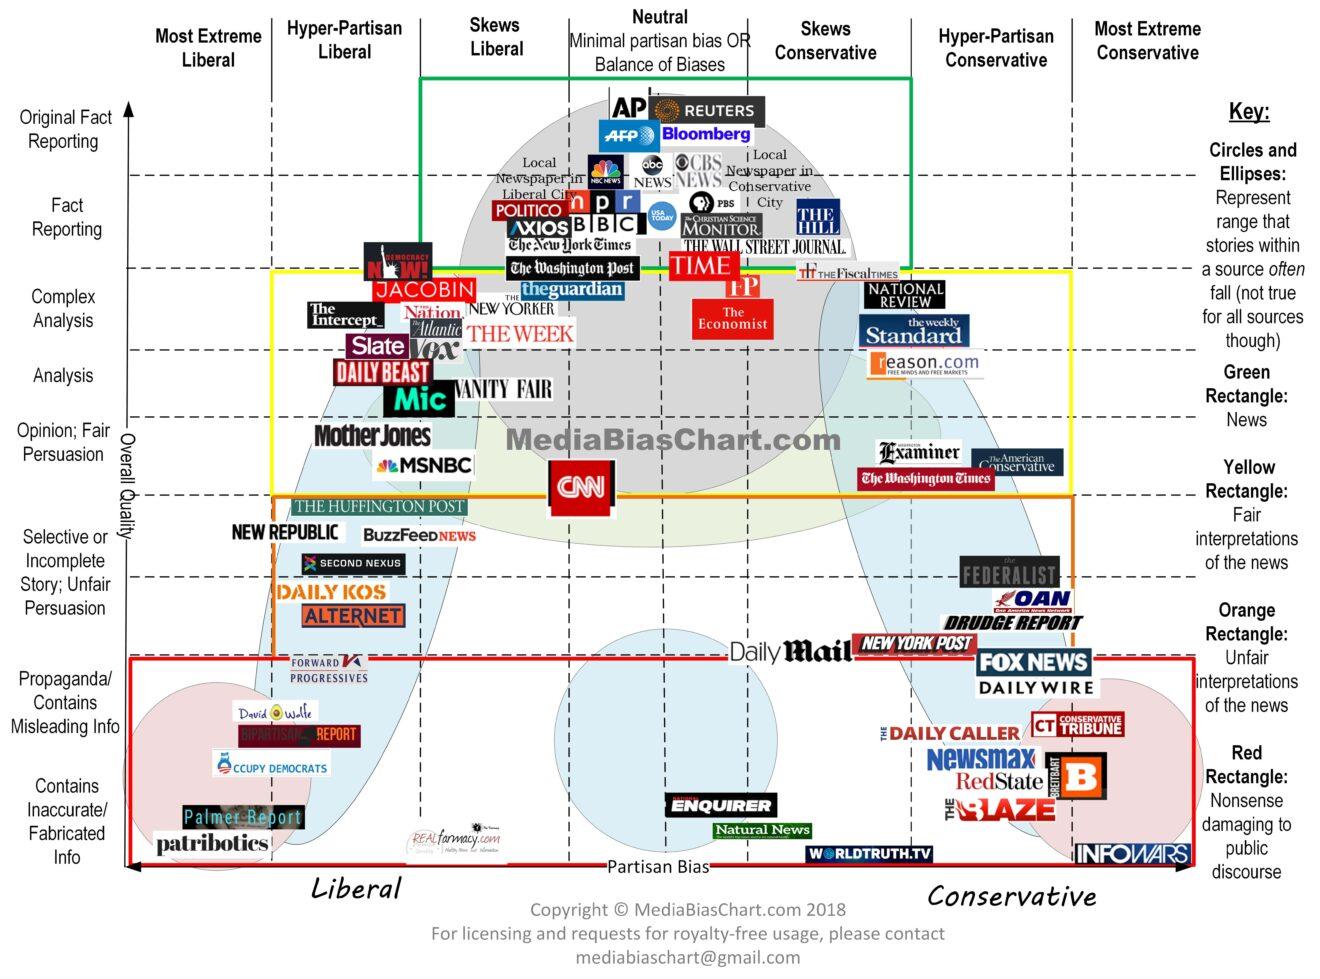 Media-Bias-Chart_4.0_Standard_License-minUsedwithPermission